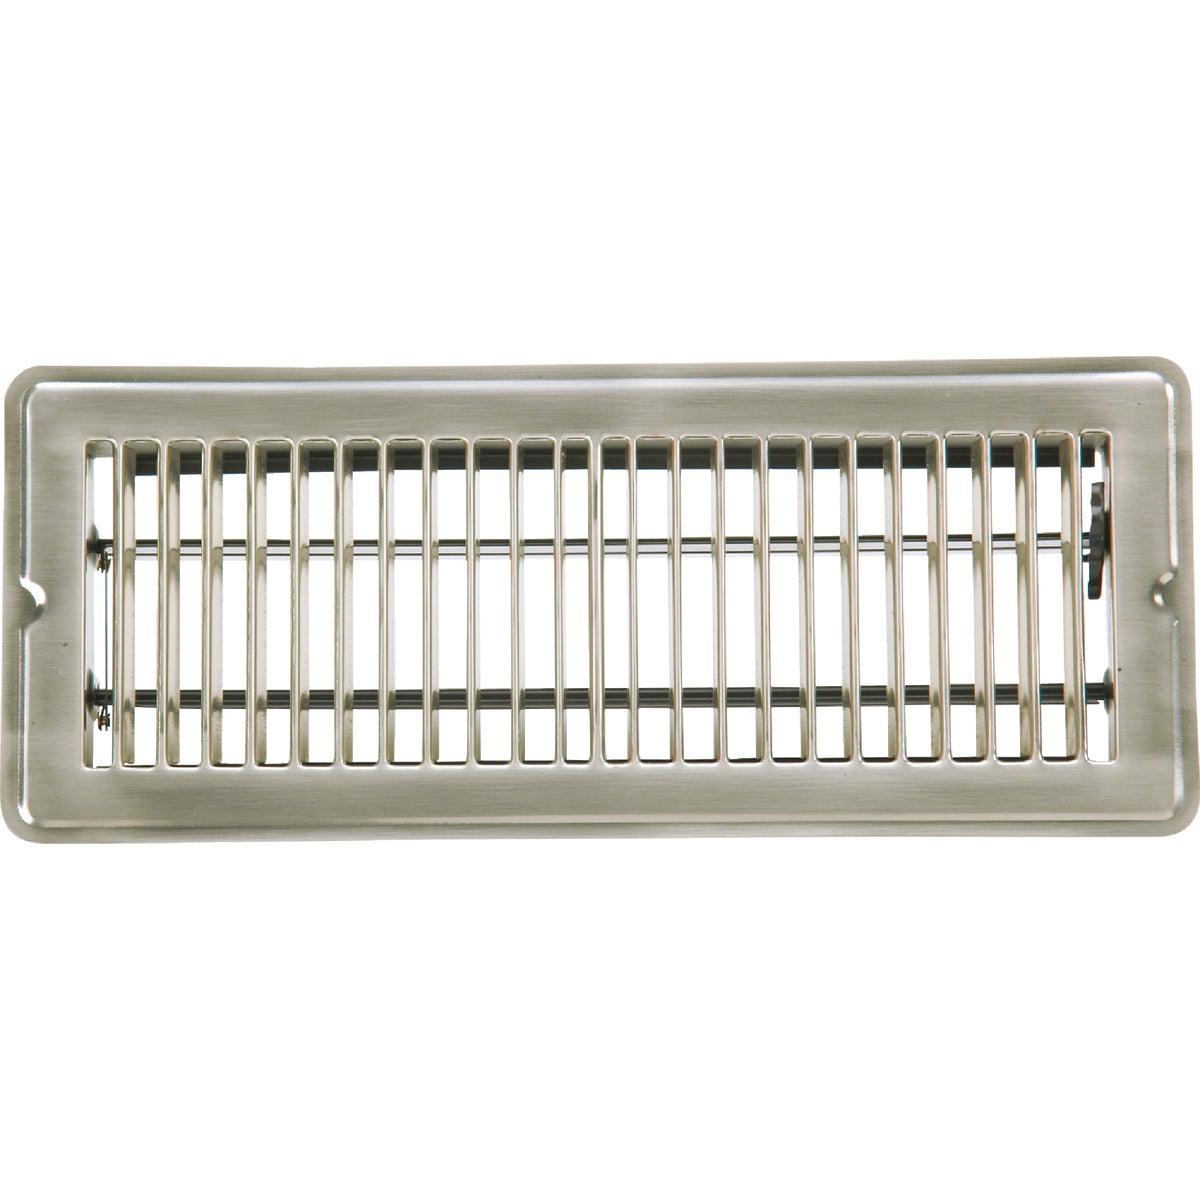 Home Impressions Stamped Brass Floor Register, 1FL0412SN-NH